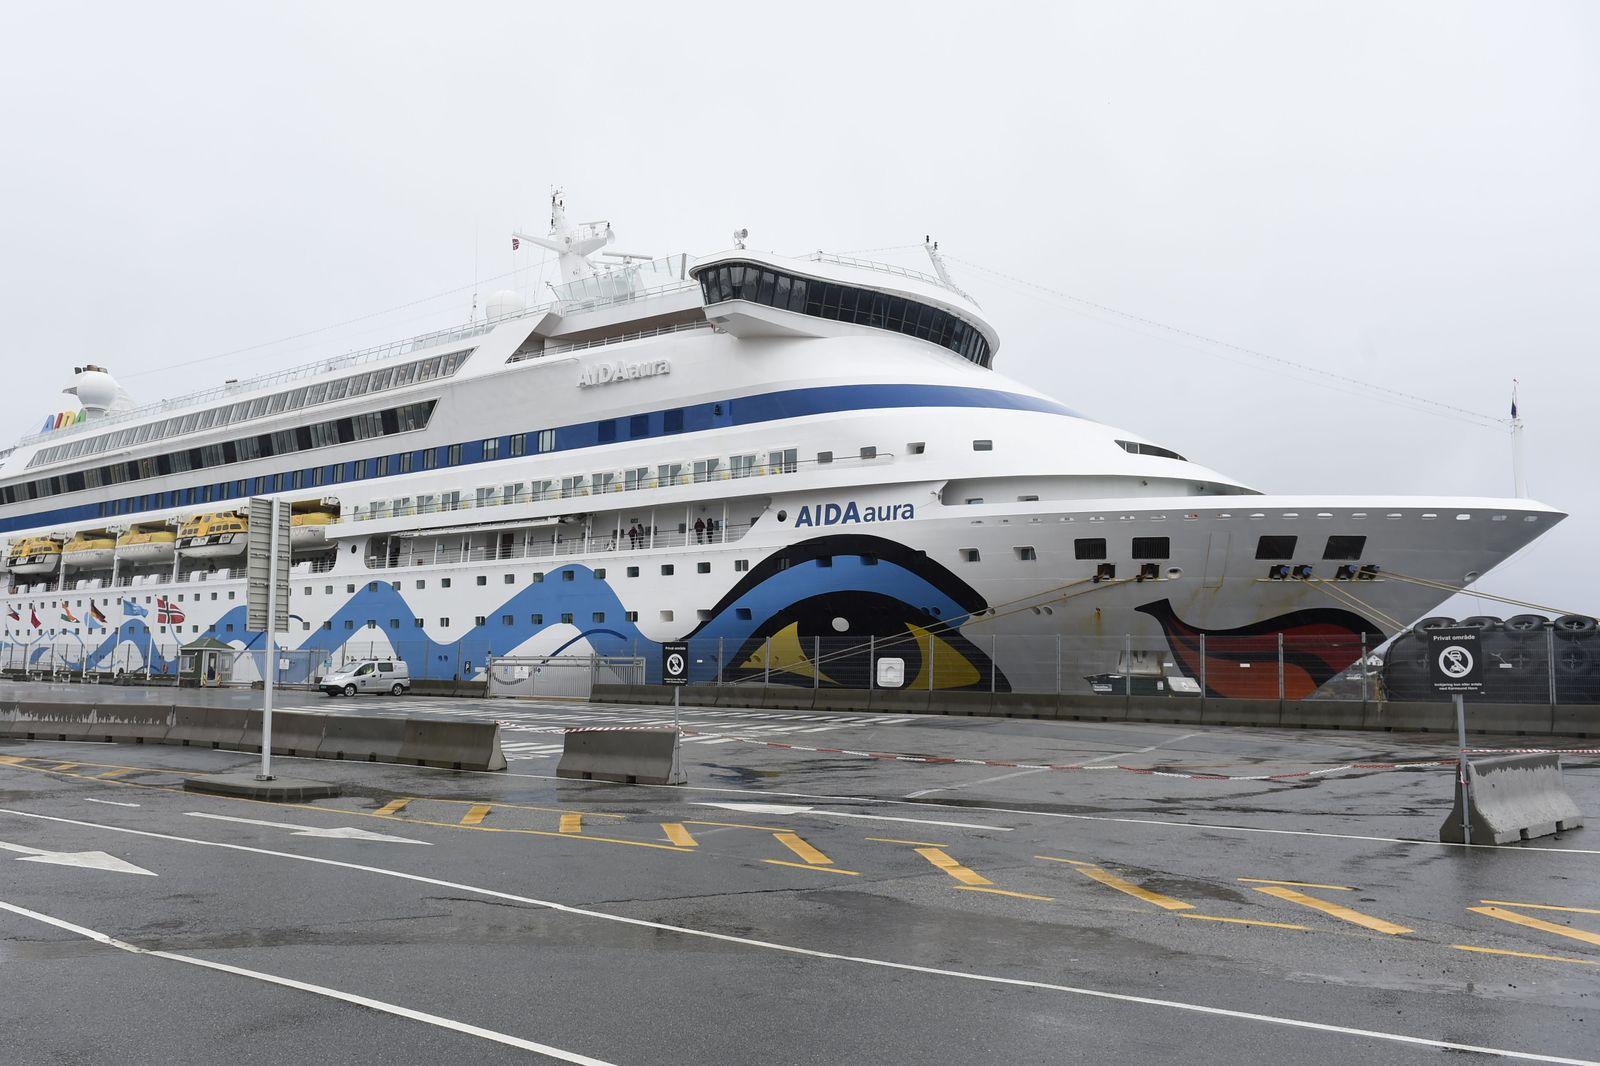 The German cruise ship Aida Aura in Haugesund, Norway - 03 Mar 2020